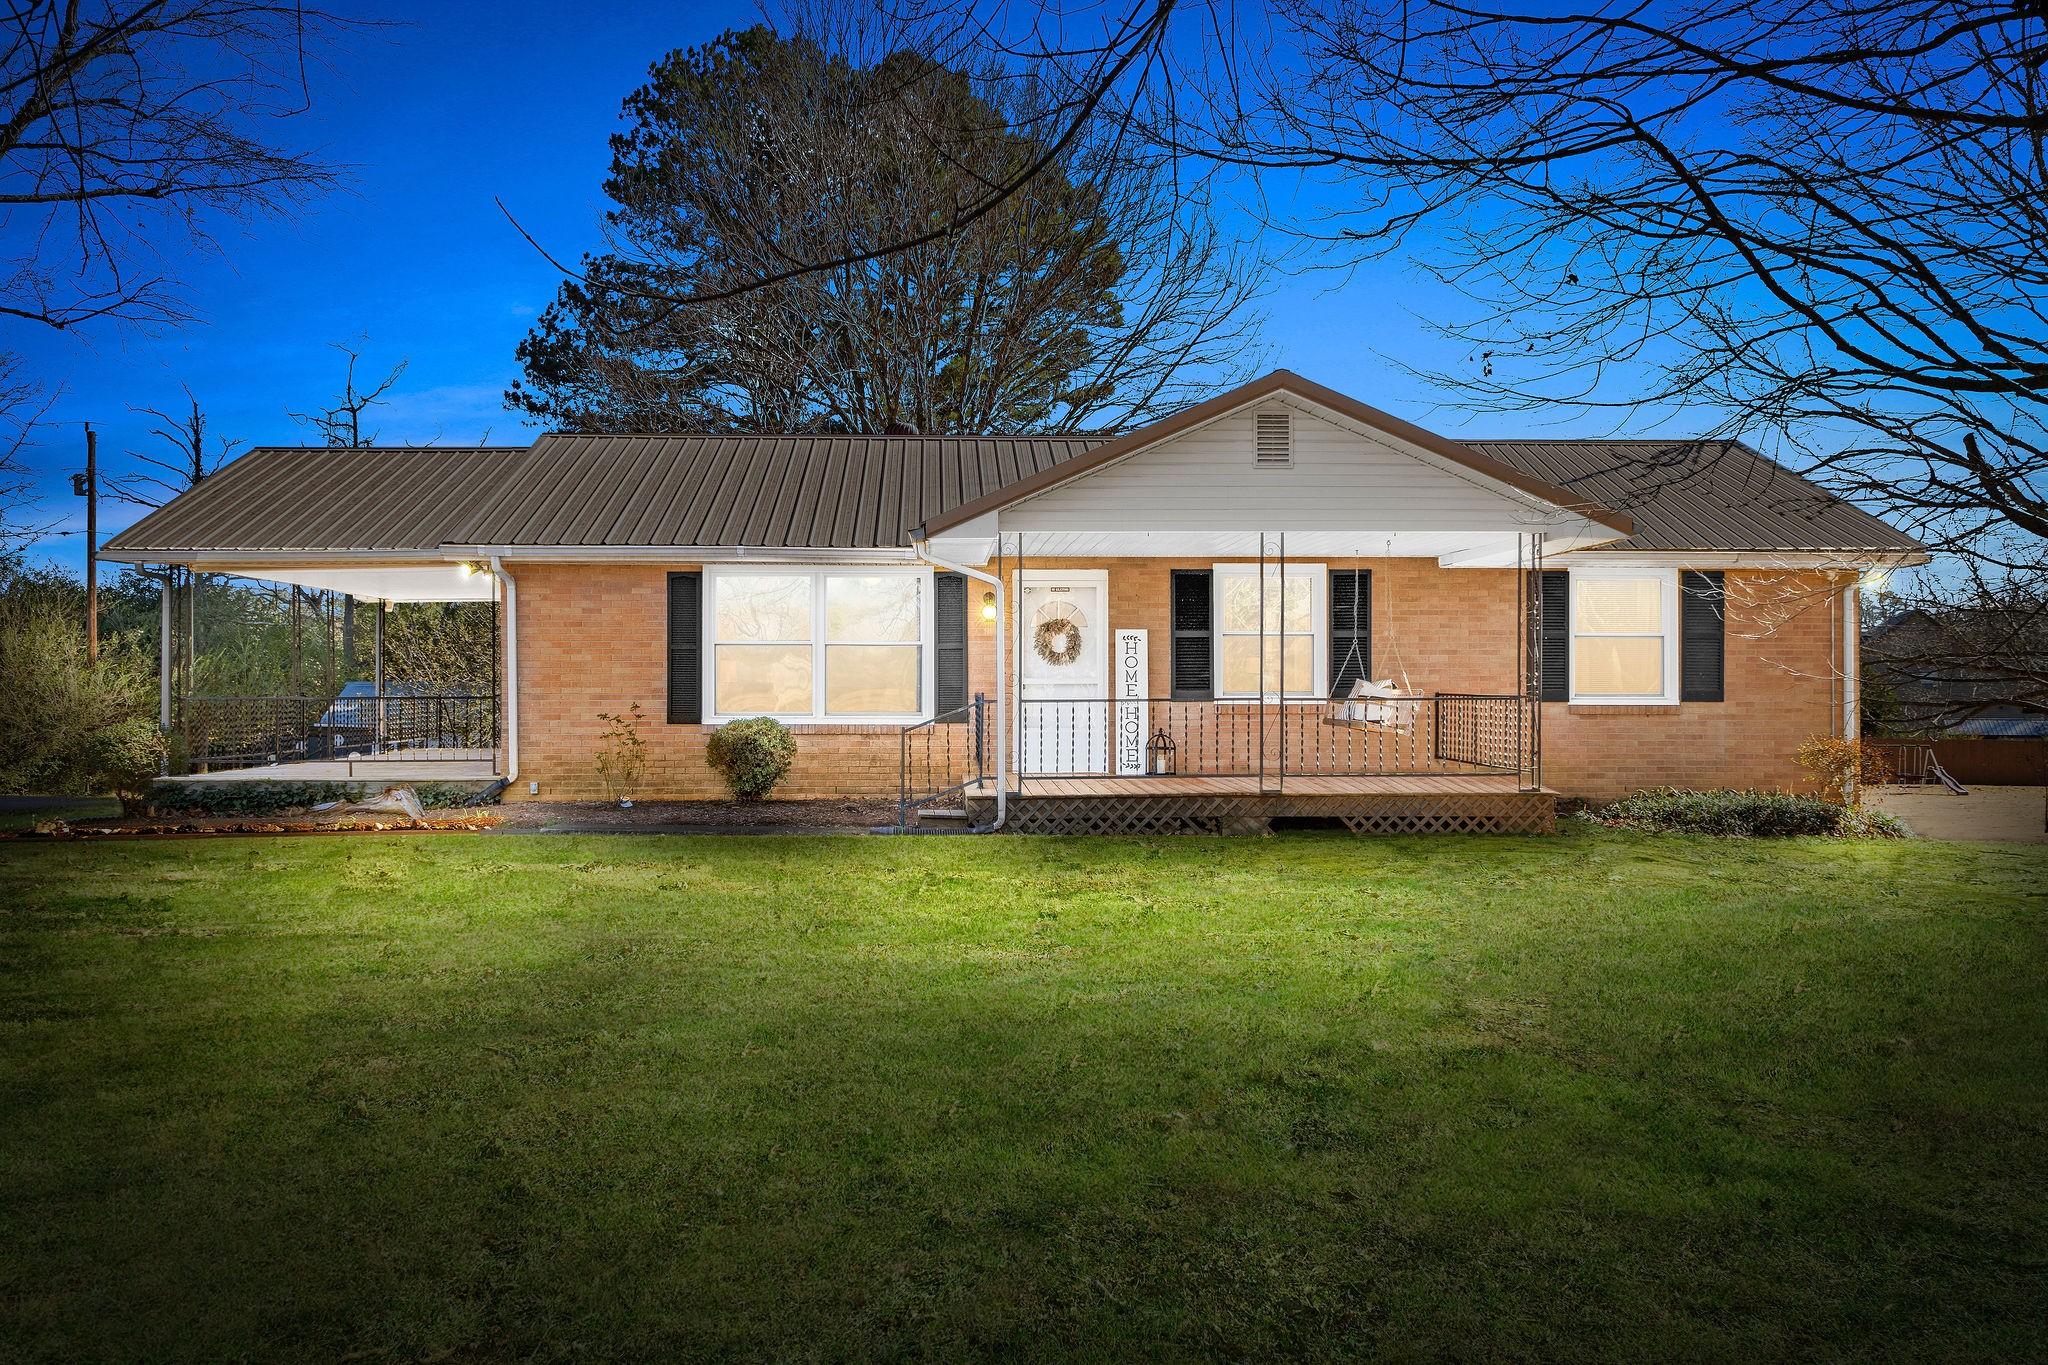 2857 Lylewood Rd Property Photo - Woodlawn, TN real estate listing